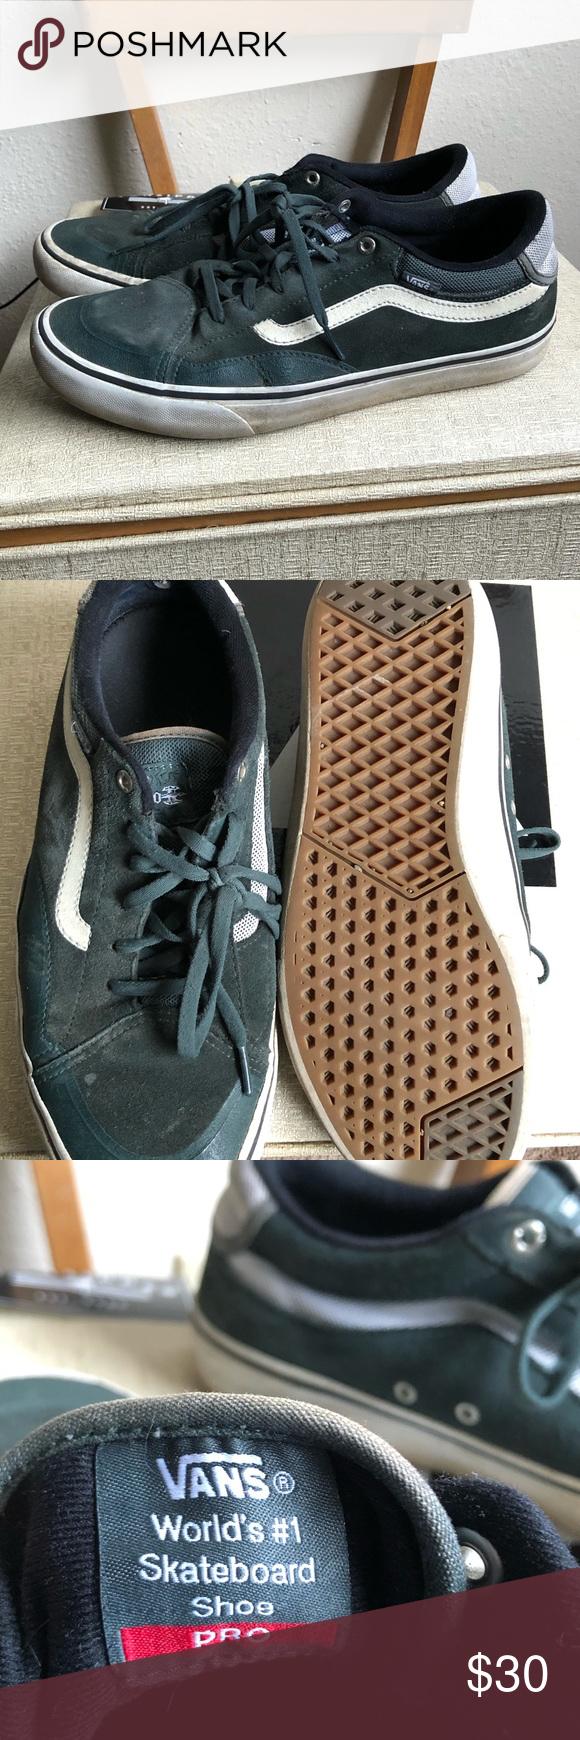 Used Vans Skate Pro Shoes in 2020